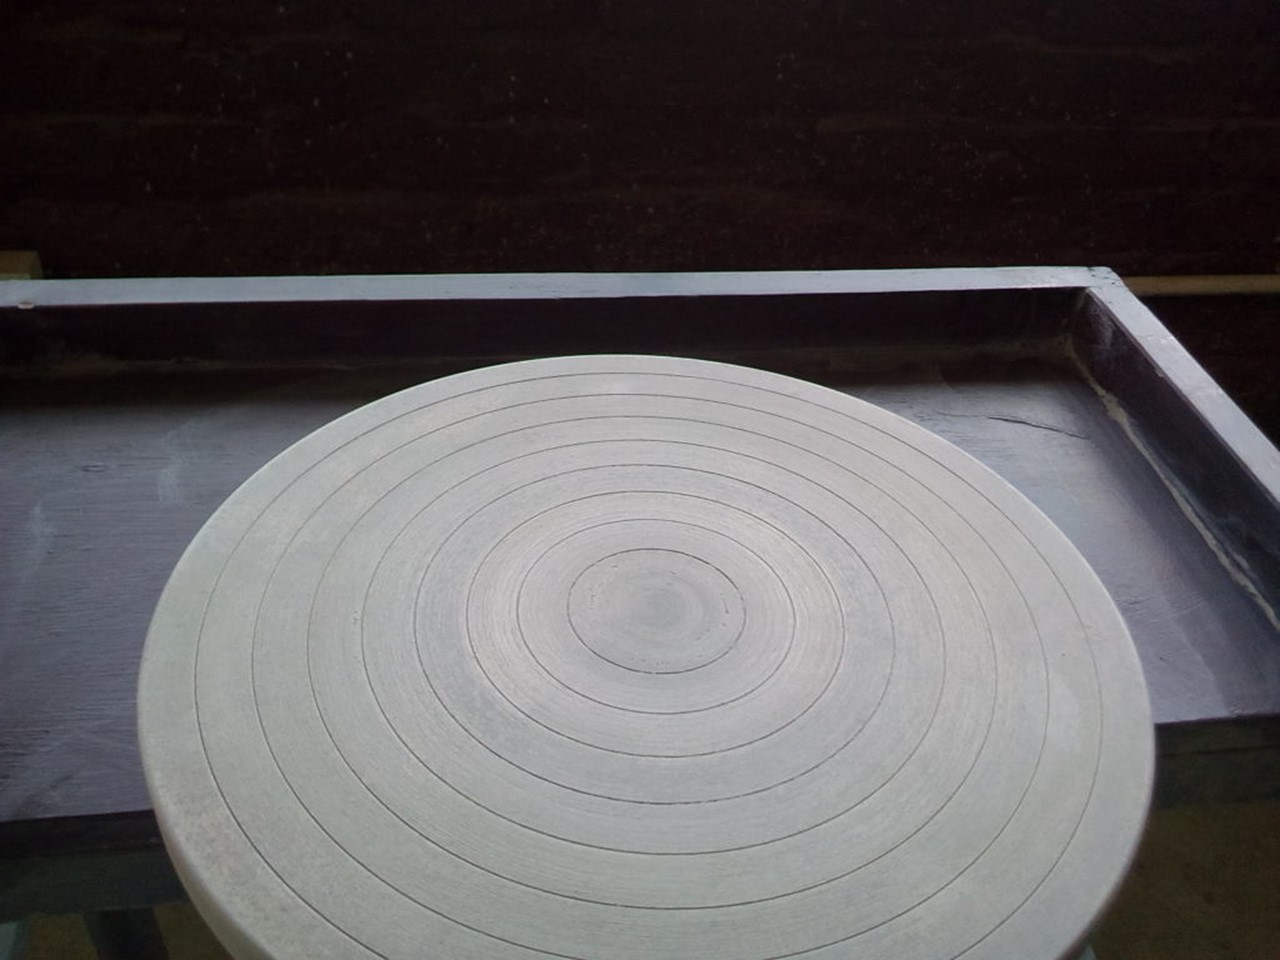 A potter's wheel